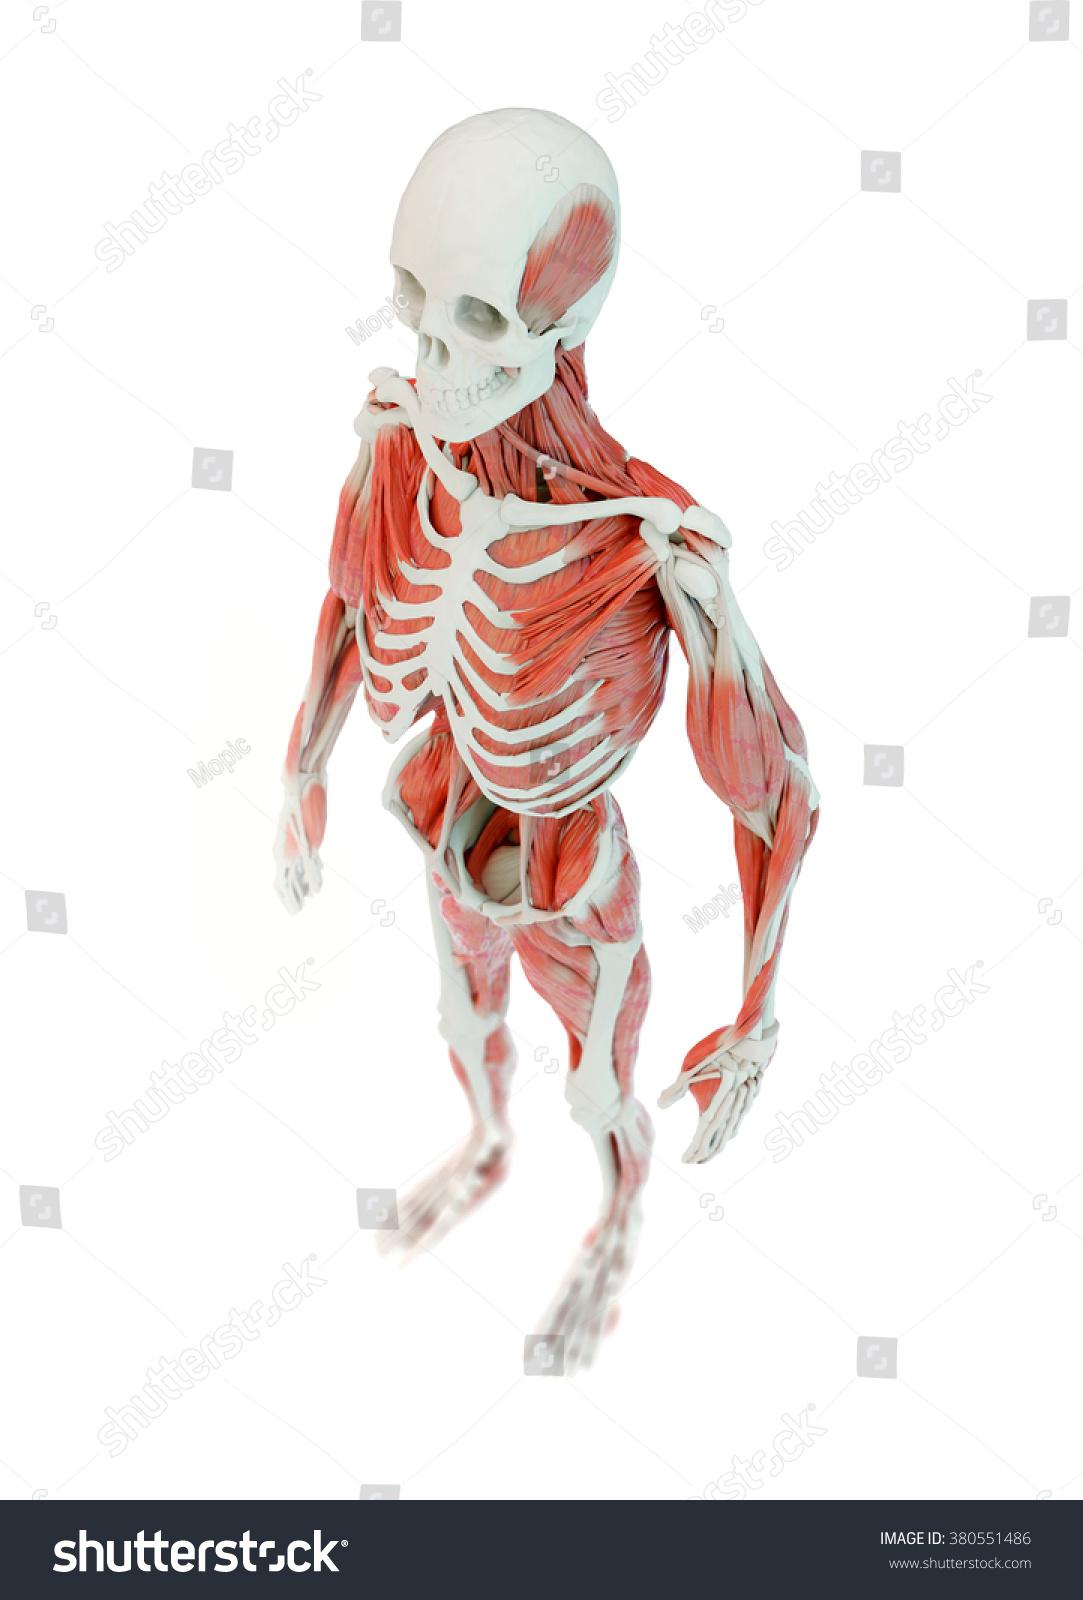 Detailed Deep Muscle Human Anatomy Illustration Stock Illustration ...